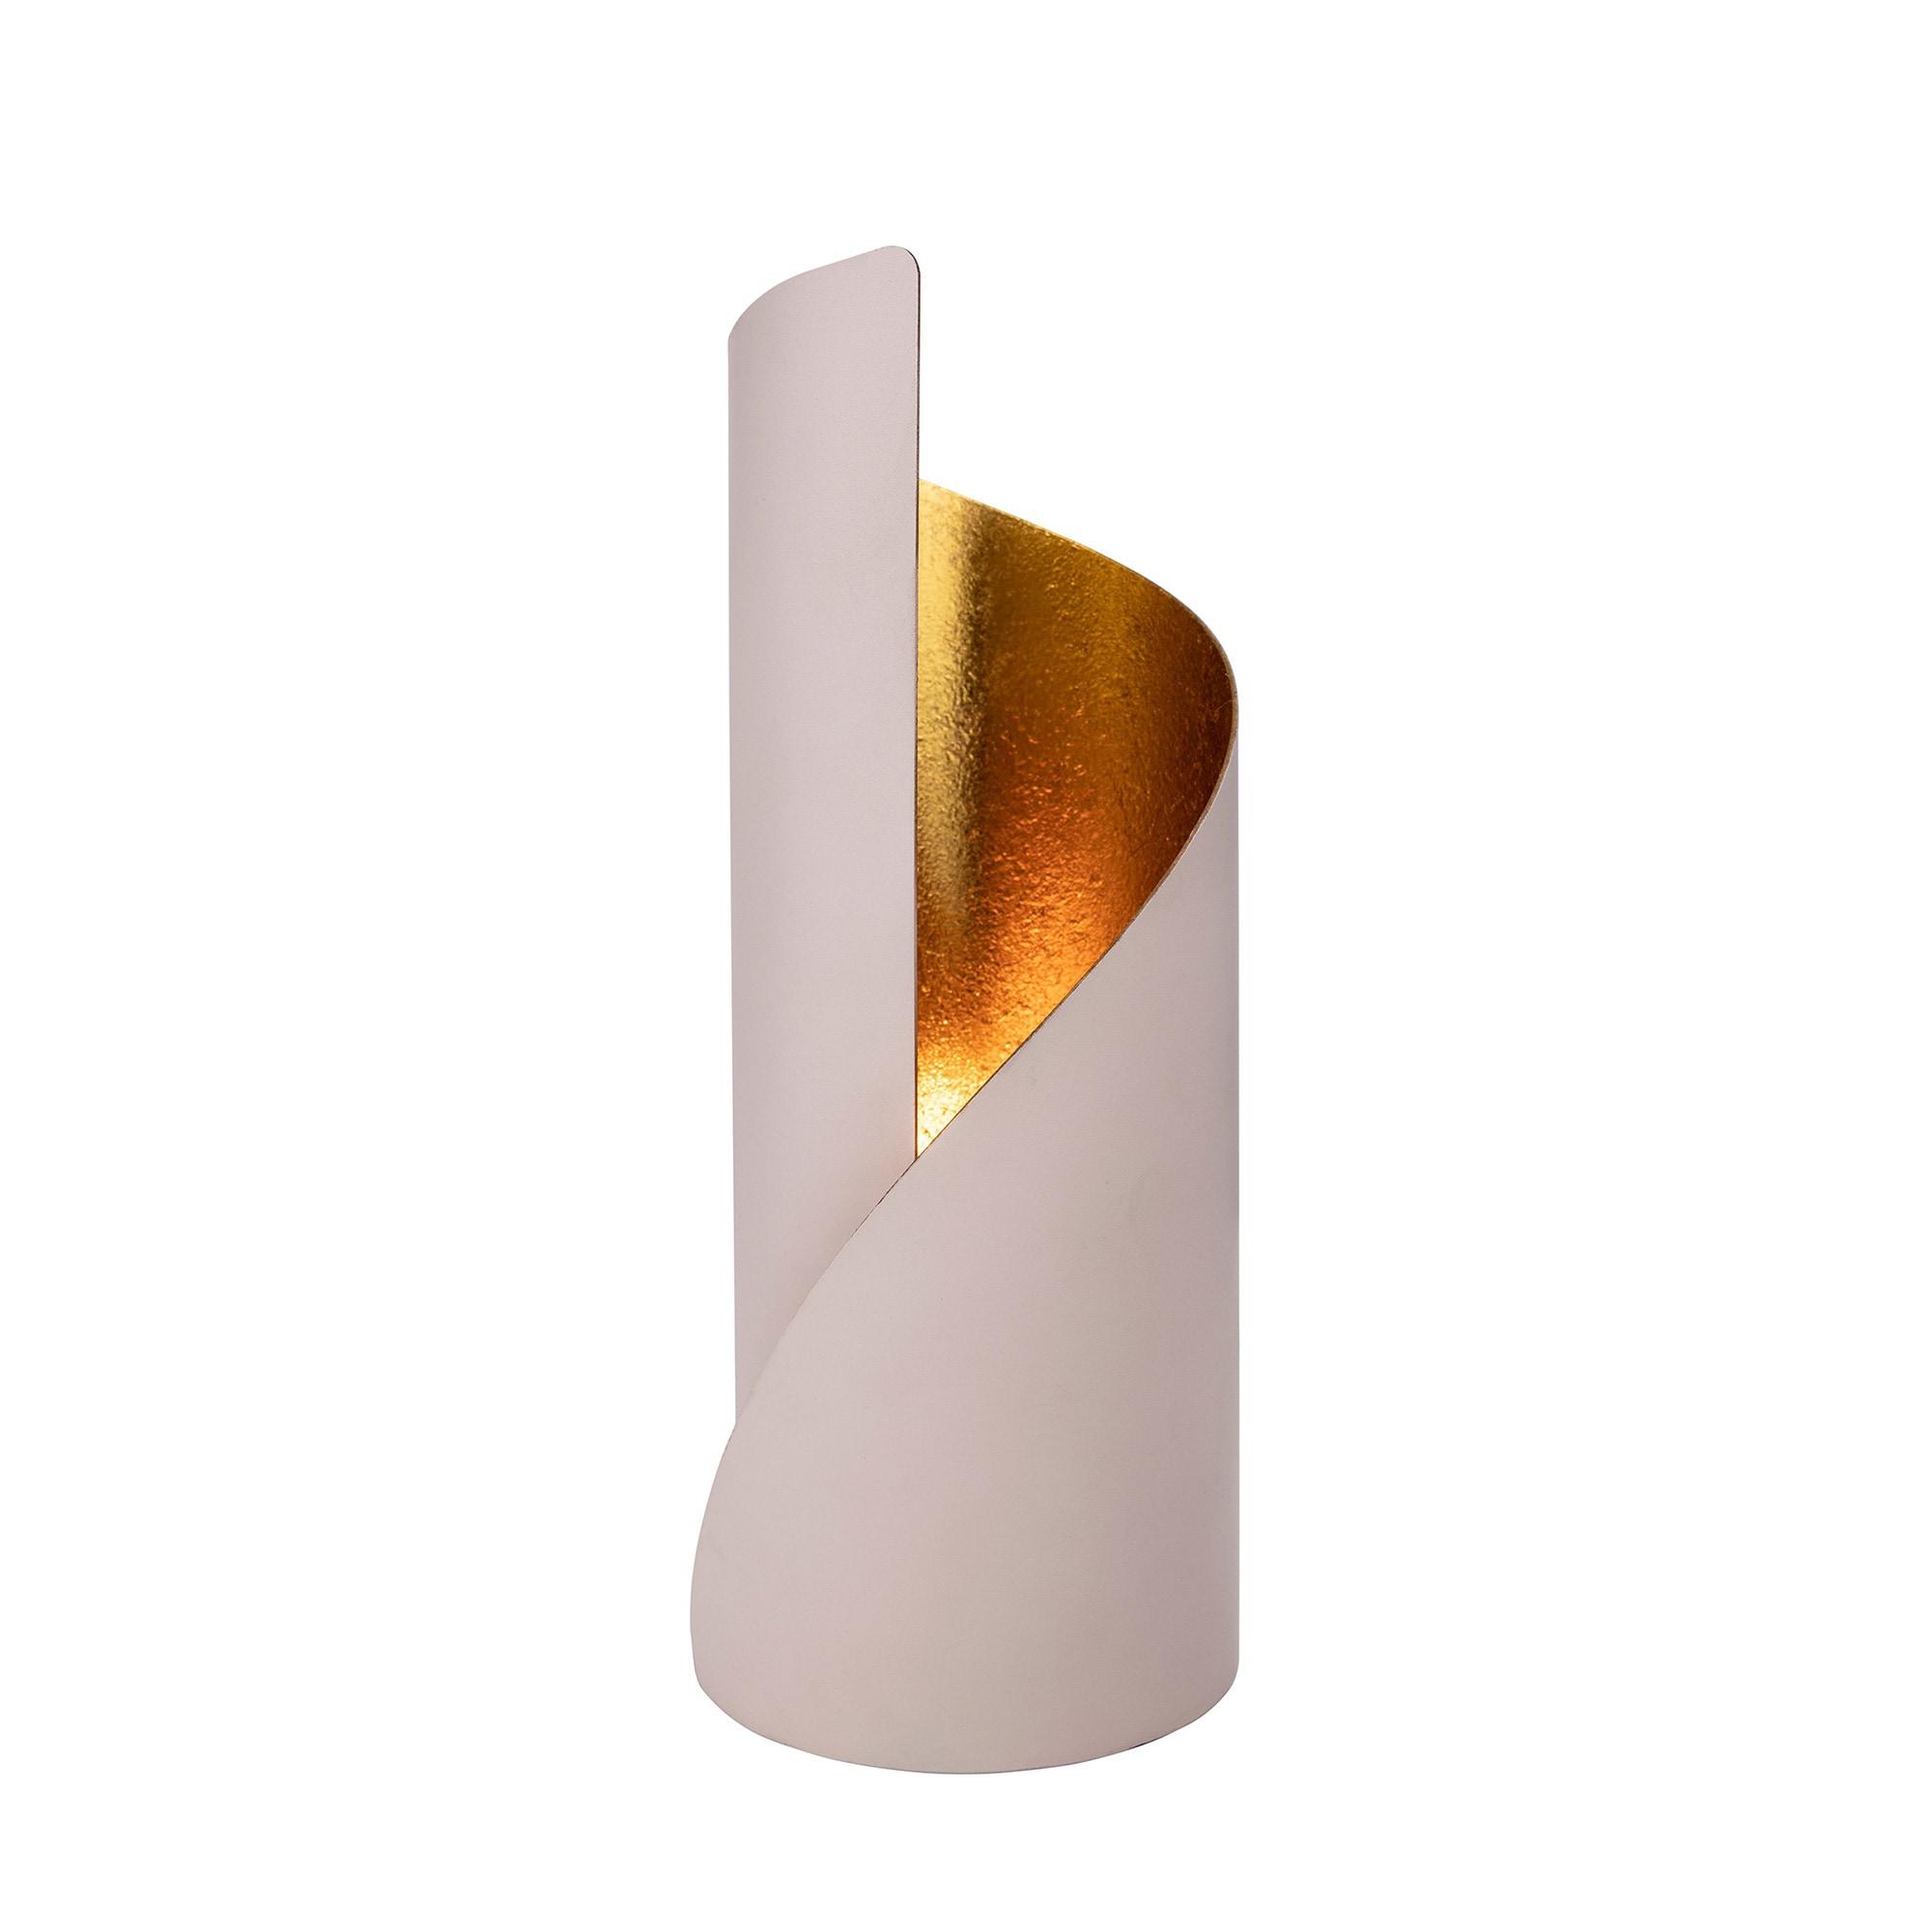 Eternity bordslampa beige